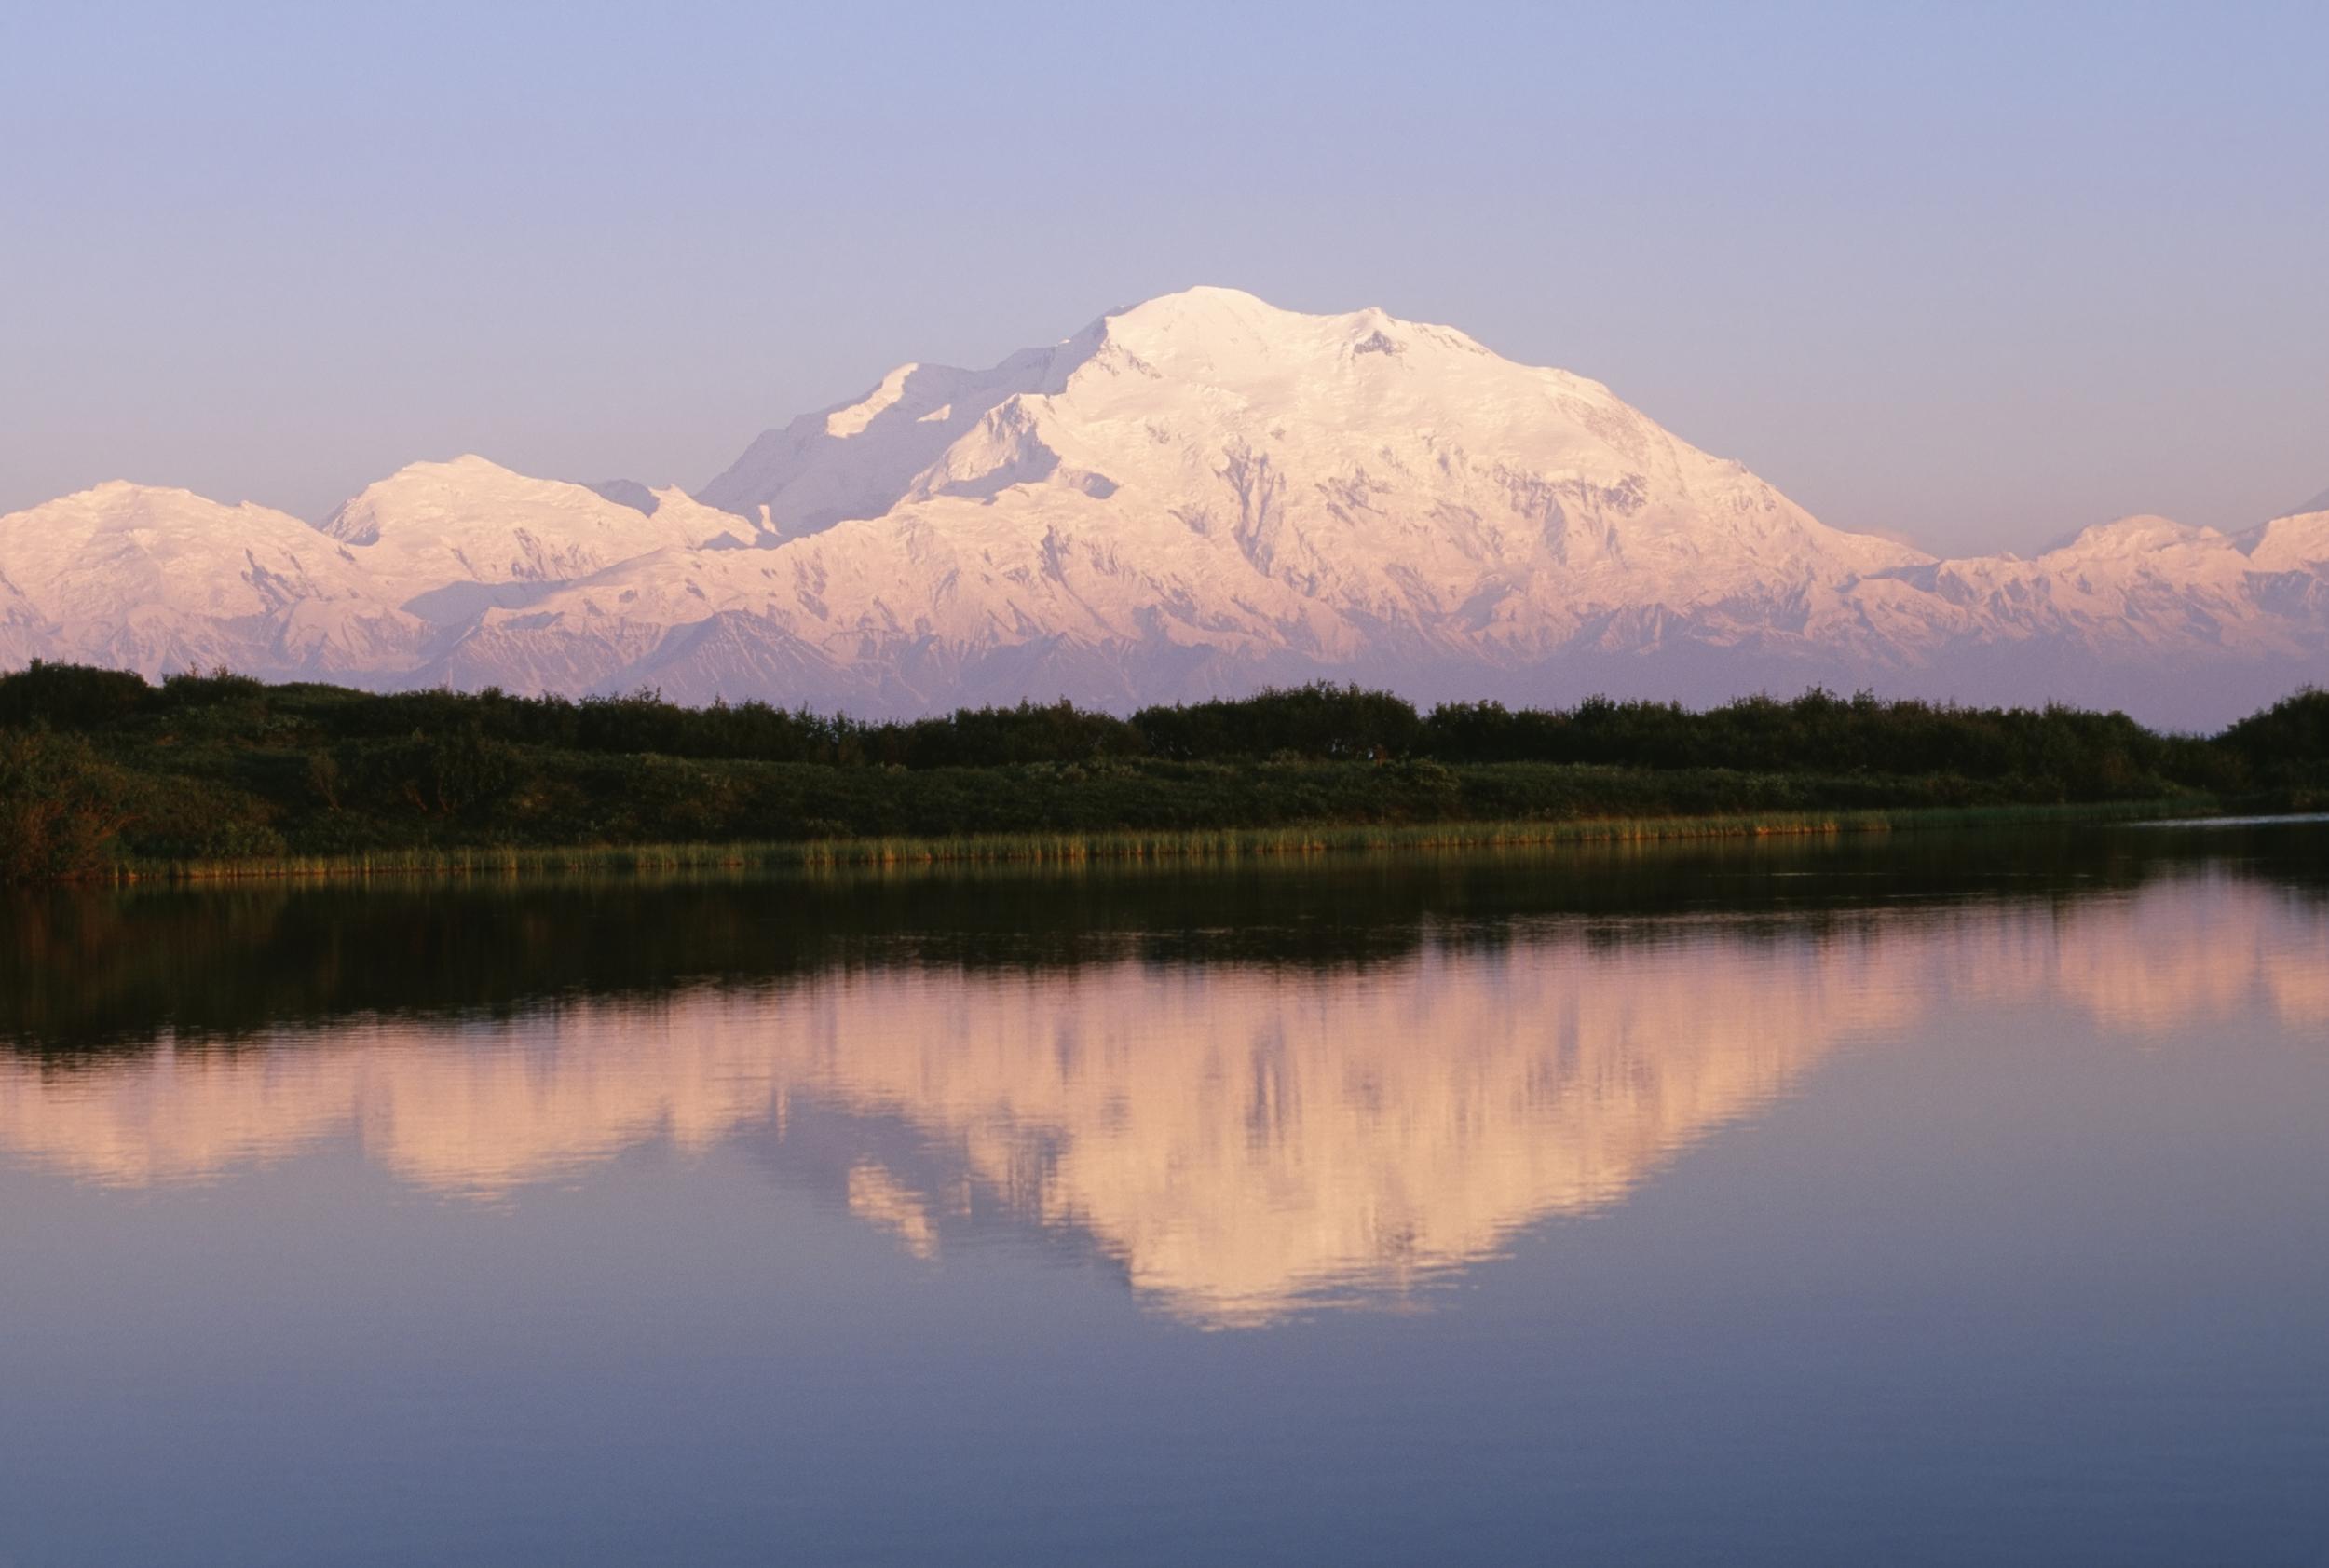 The beautiful Alaskan countryside